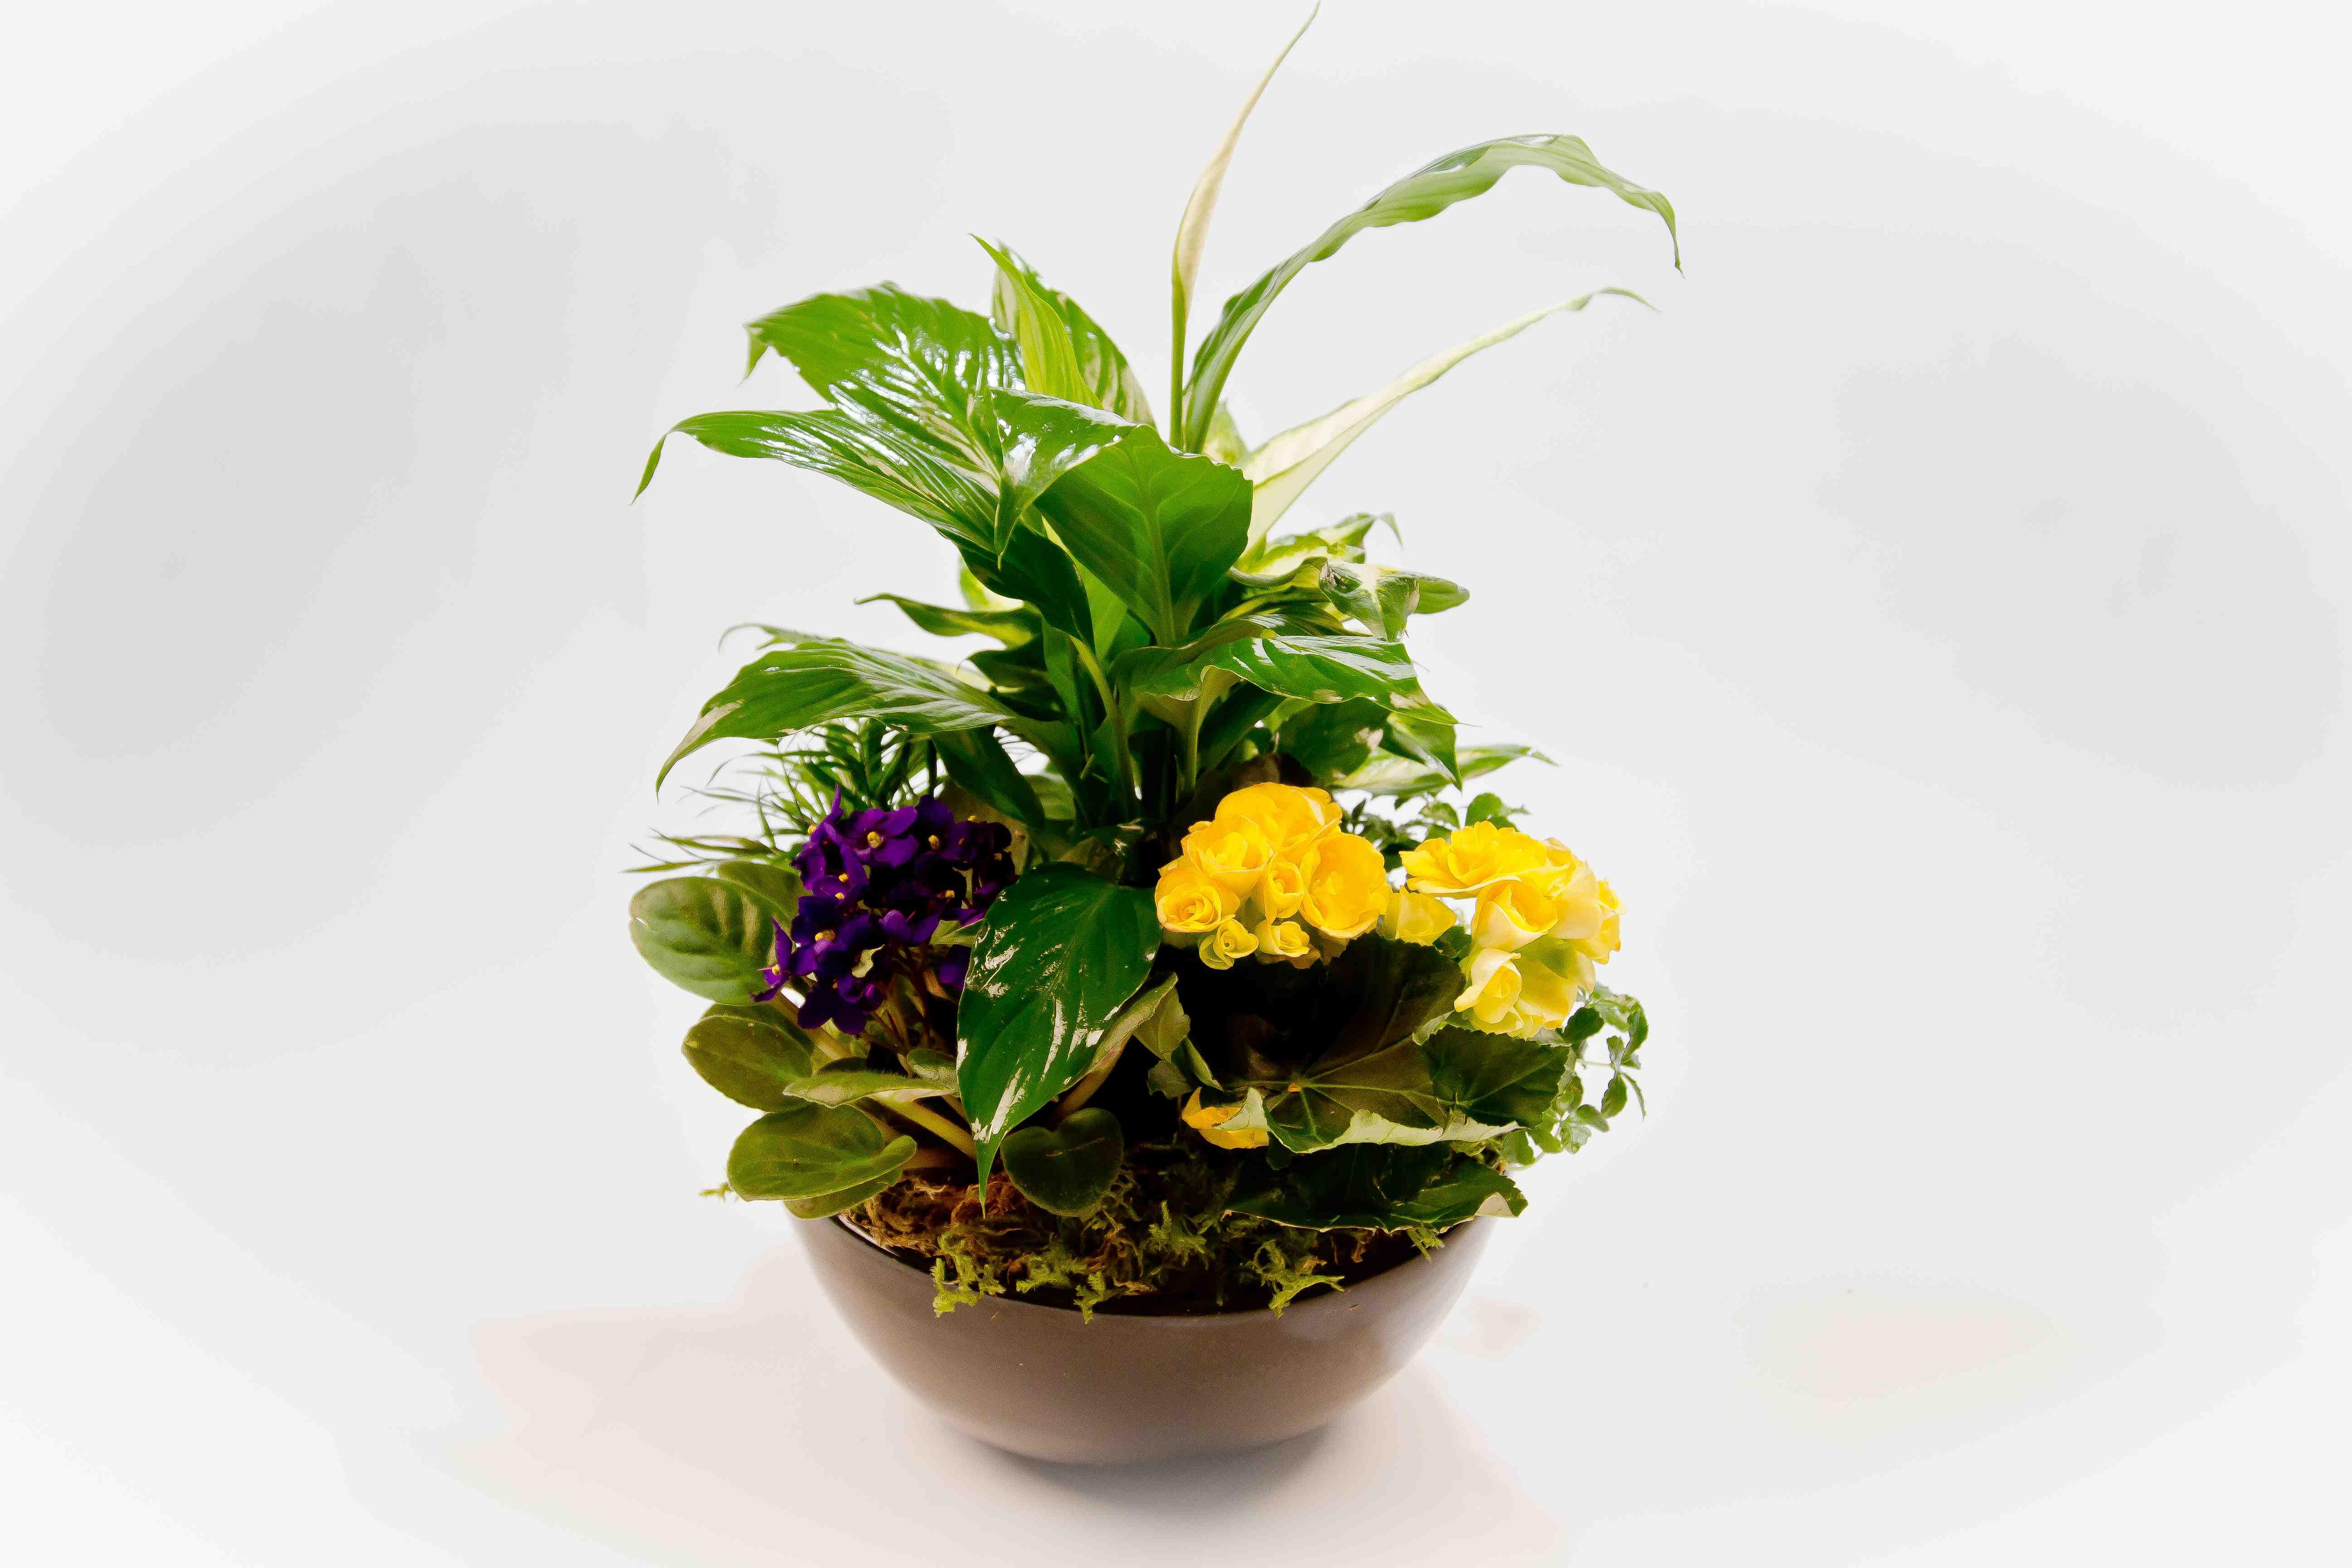 Flower Arrangements Gift Baskets : Arrangement jacobsen s flowers gift baskets